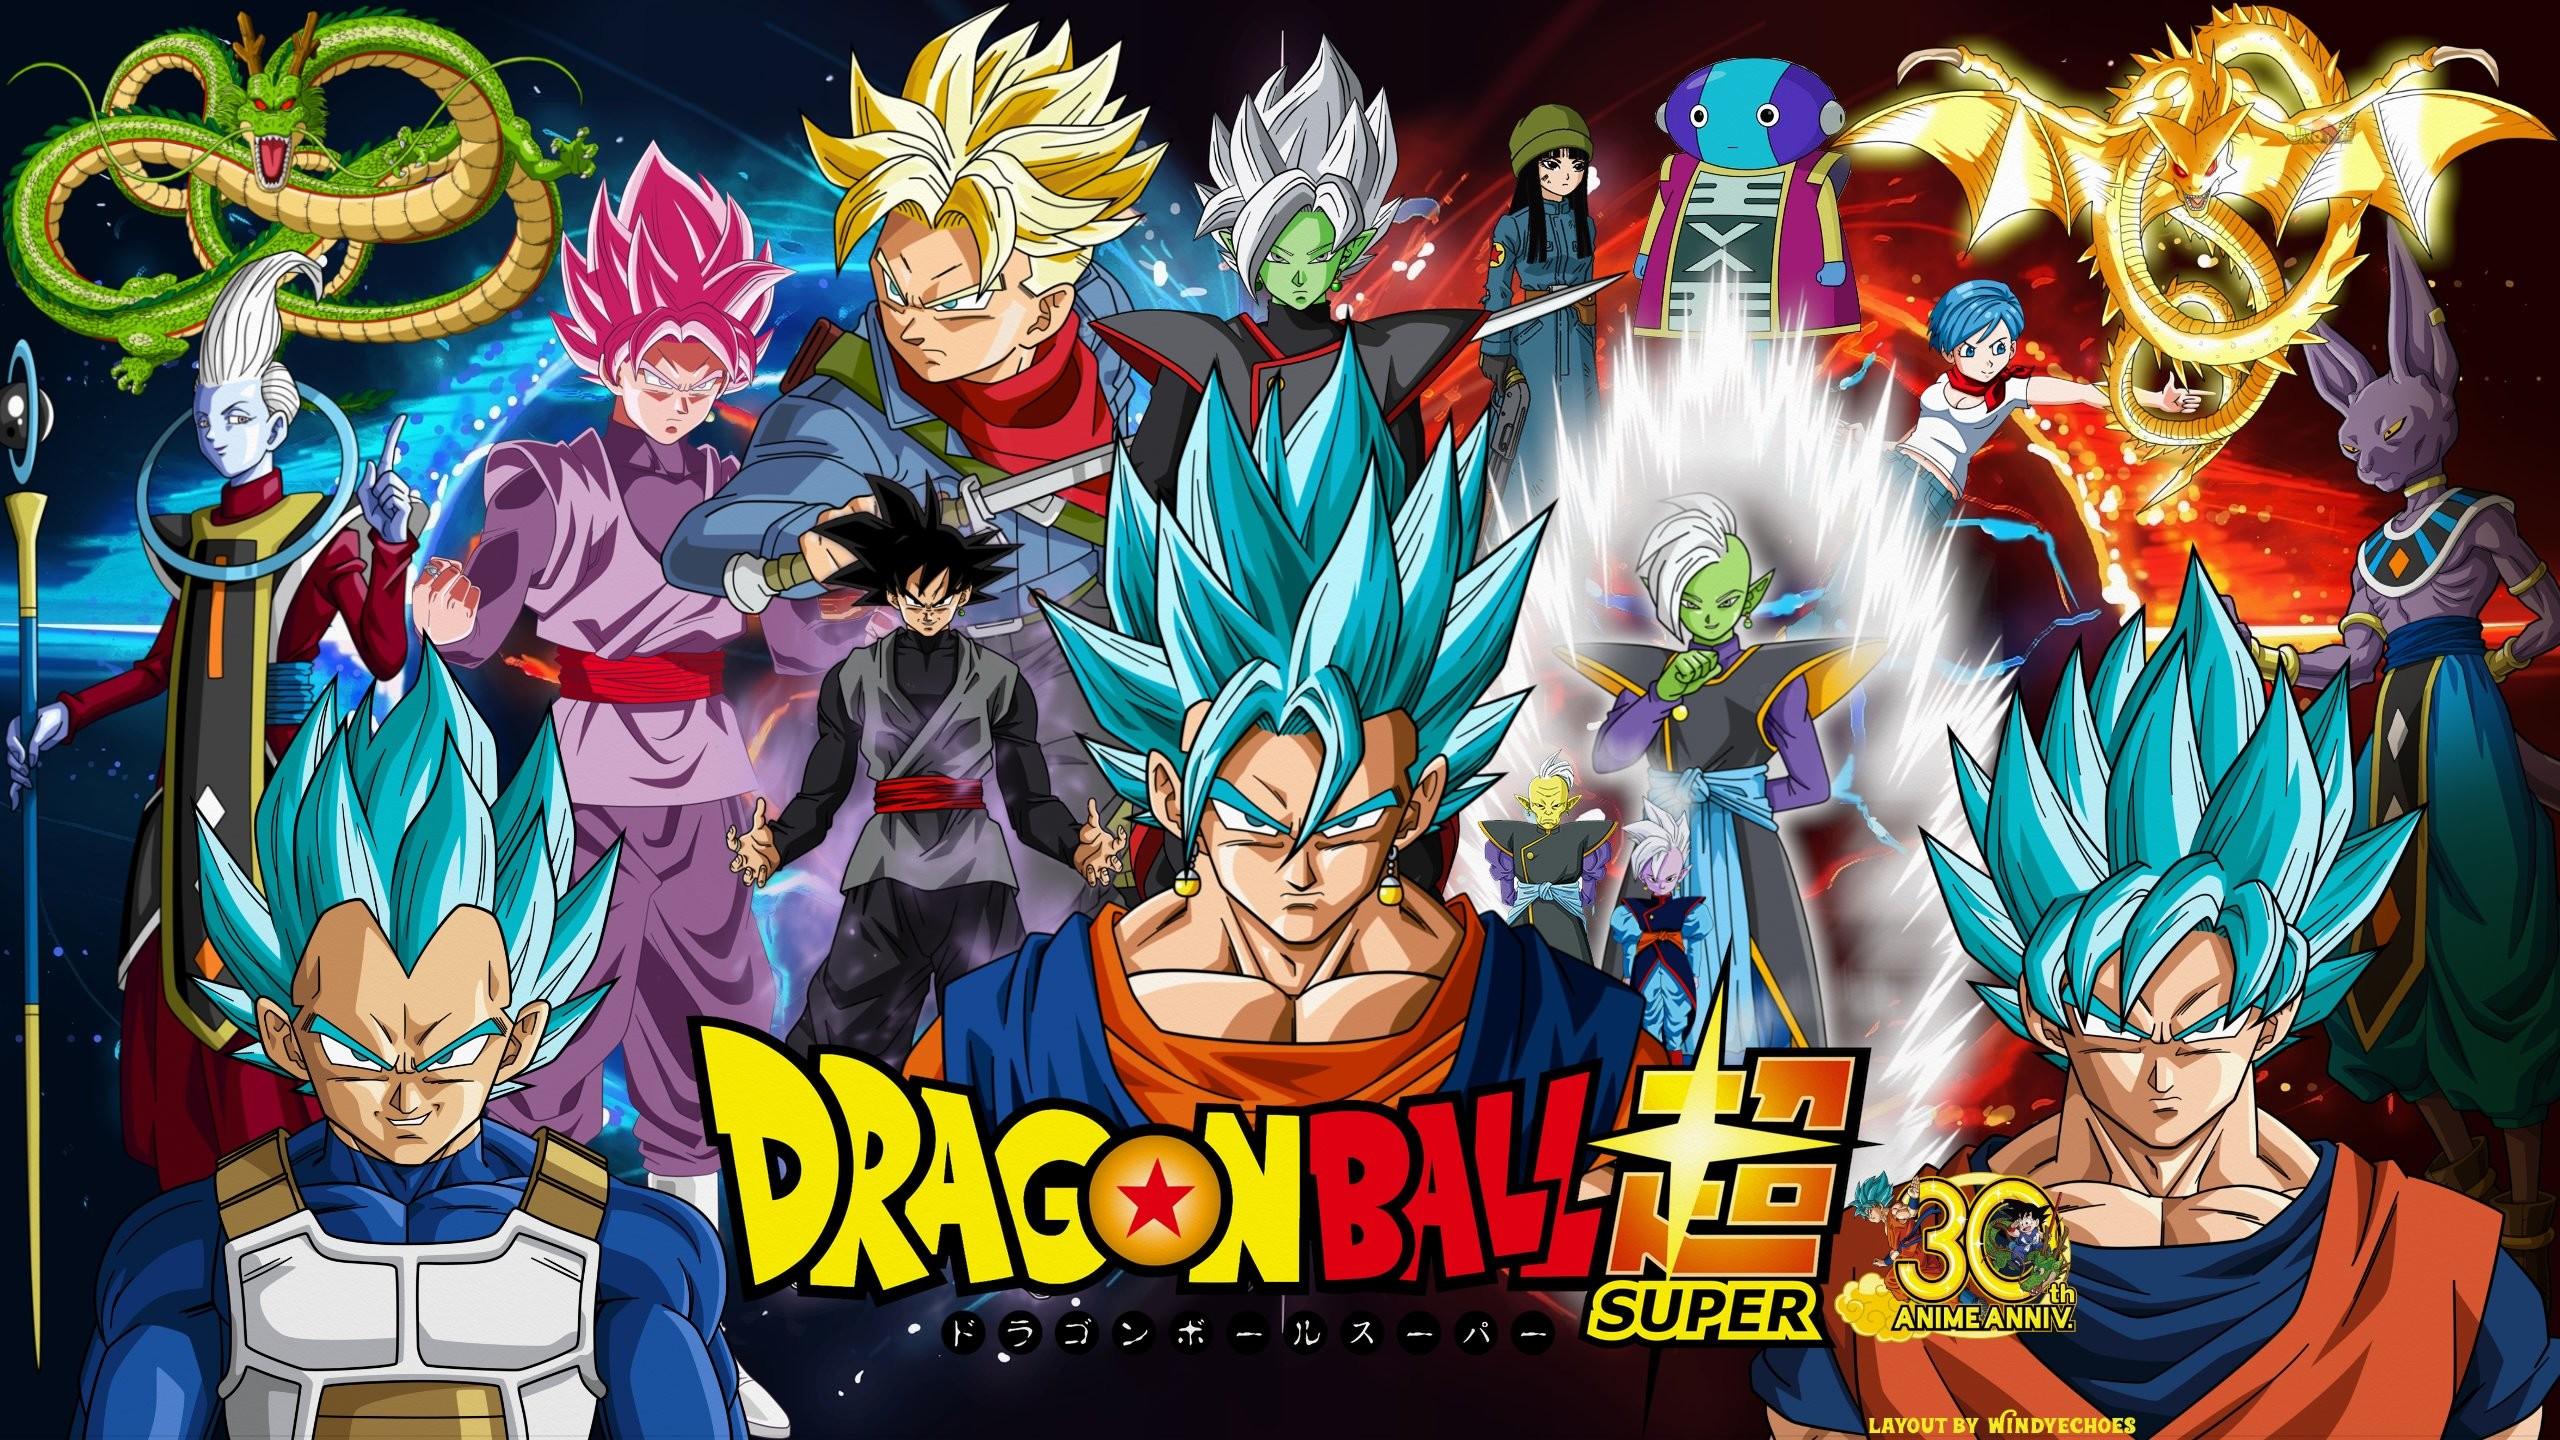 … Dragon Ball Super Wallpaper Vegito VS Zamasu by WindyEchoes